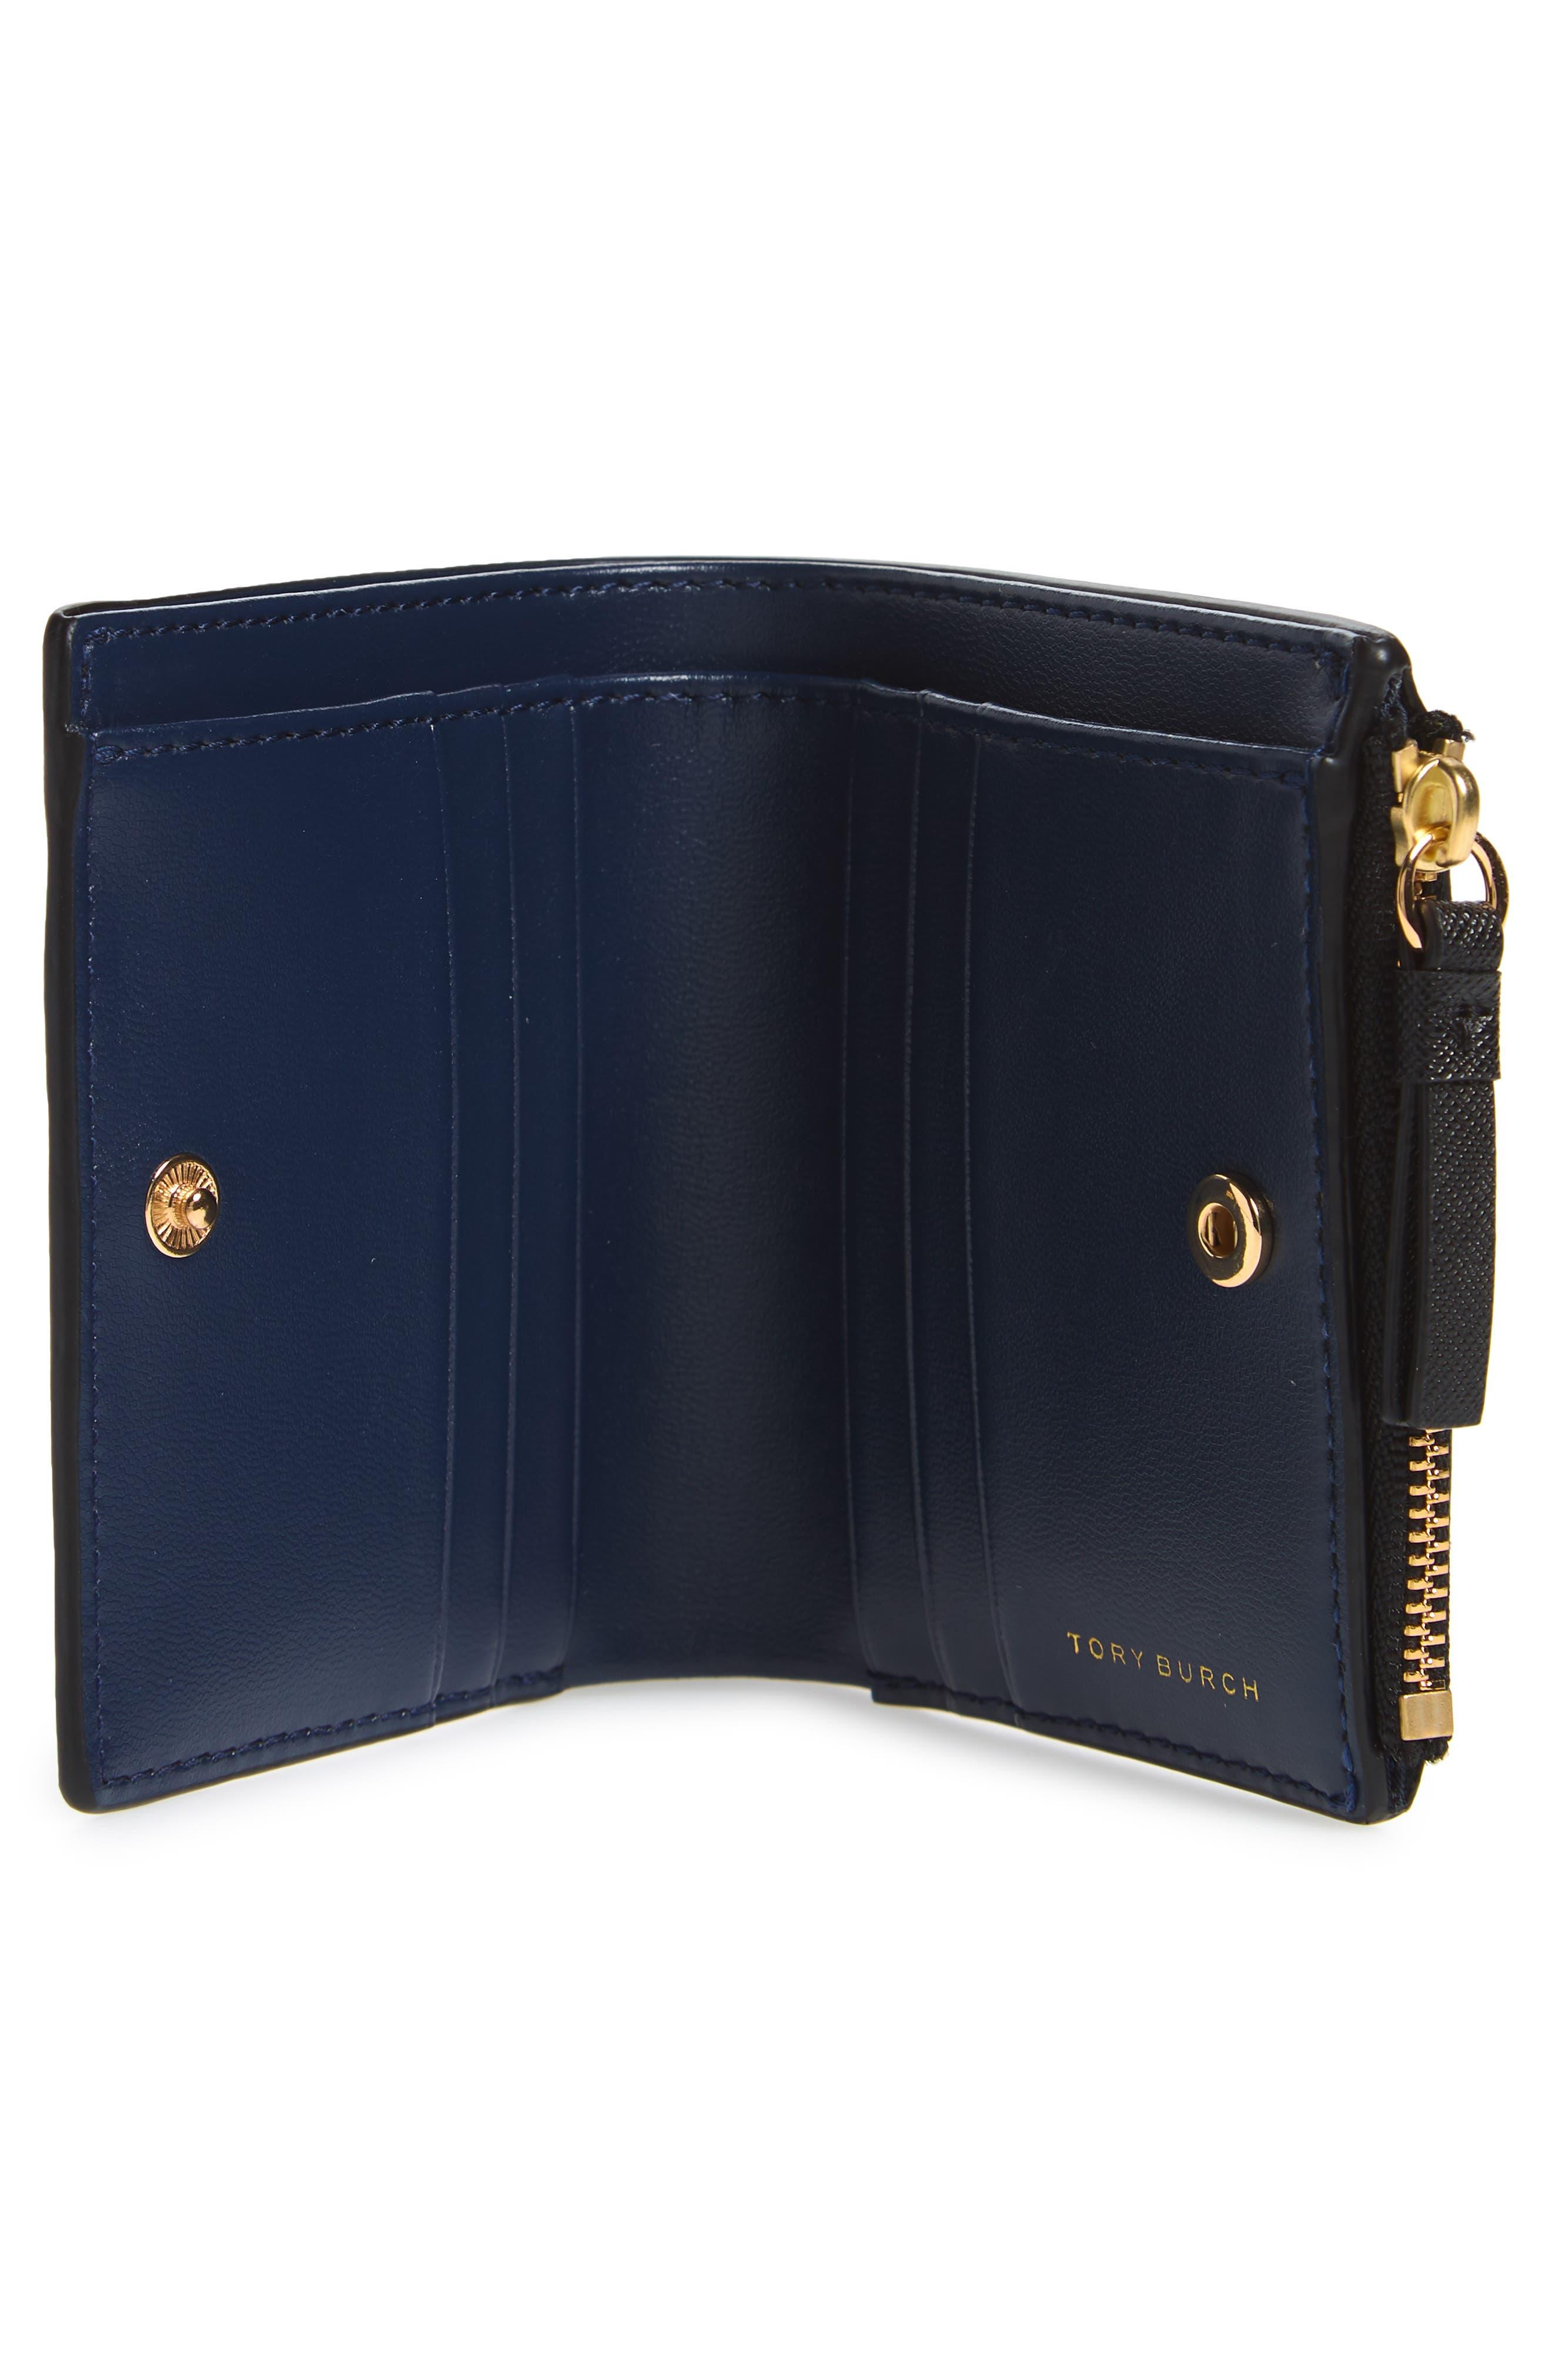 TORY BURCH,                             Mini Robinson Wallet Leather Bifold Wallet,                             Alternate thumbnail 2, color,                             BLACK / ROYAL NAVY